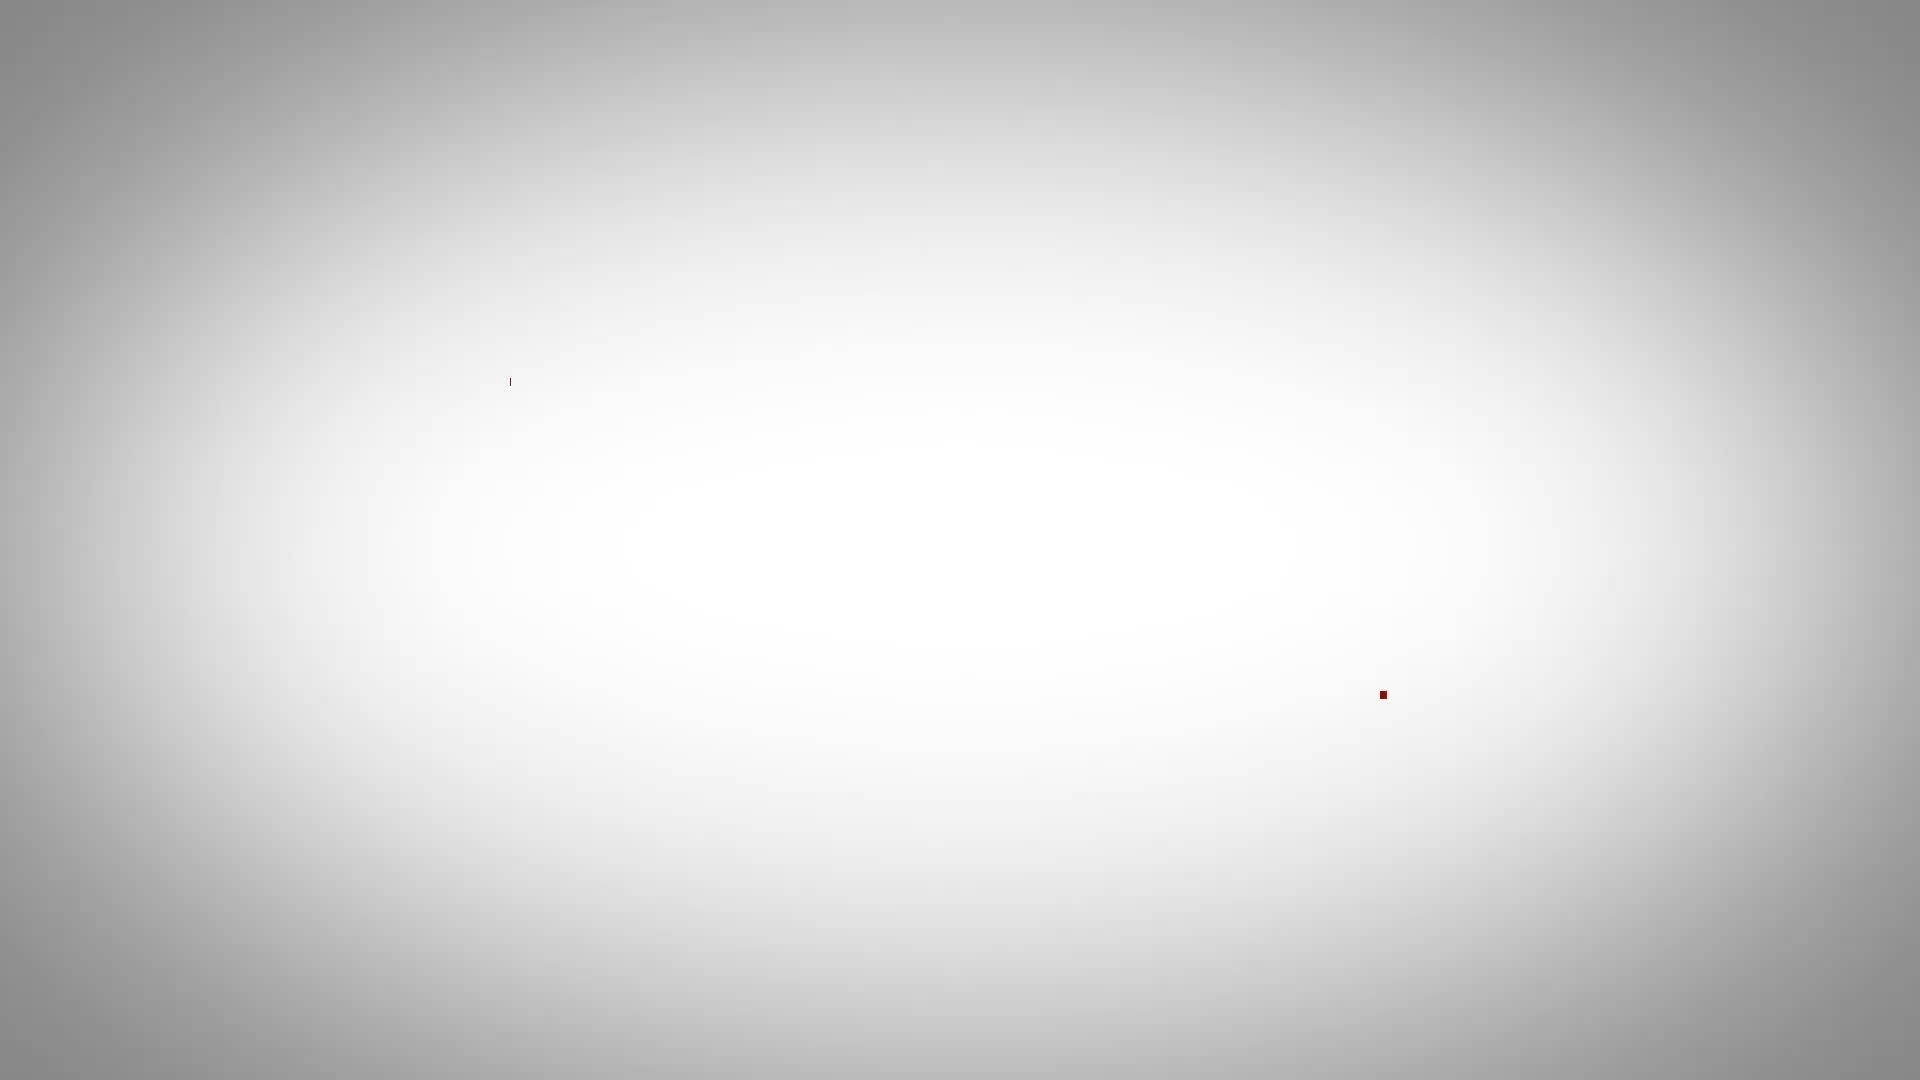 Image of ਕਿਸੇ ਨੇ ਐਵੇਂ ਨਹੀਂ ਕਿਹਾ ਕਿ 'ਕਾਨੂੰਨ ਦੇ ਹੱਥ ਬੜੇ ਲੰਬੇ ਹੁੰਦੇ ਨੇ'